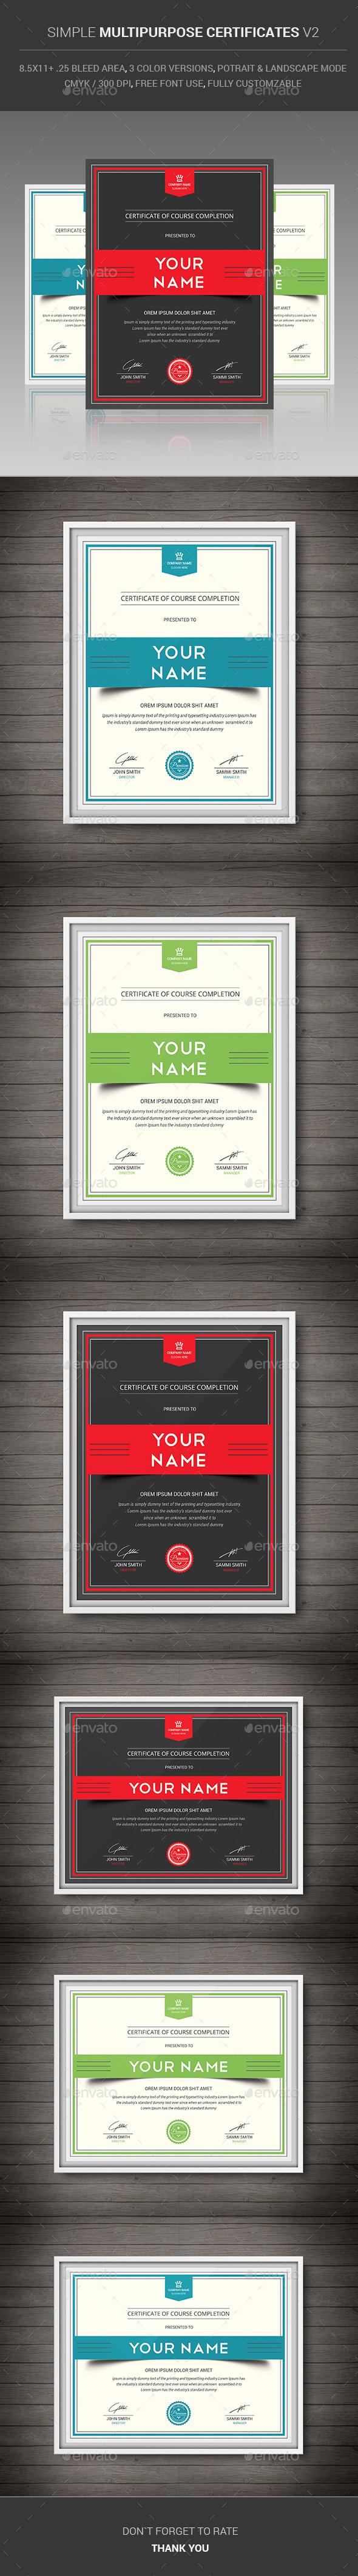 GraphicRiver Simple Multipurpose Certificates v2 11581171